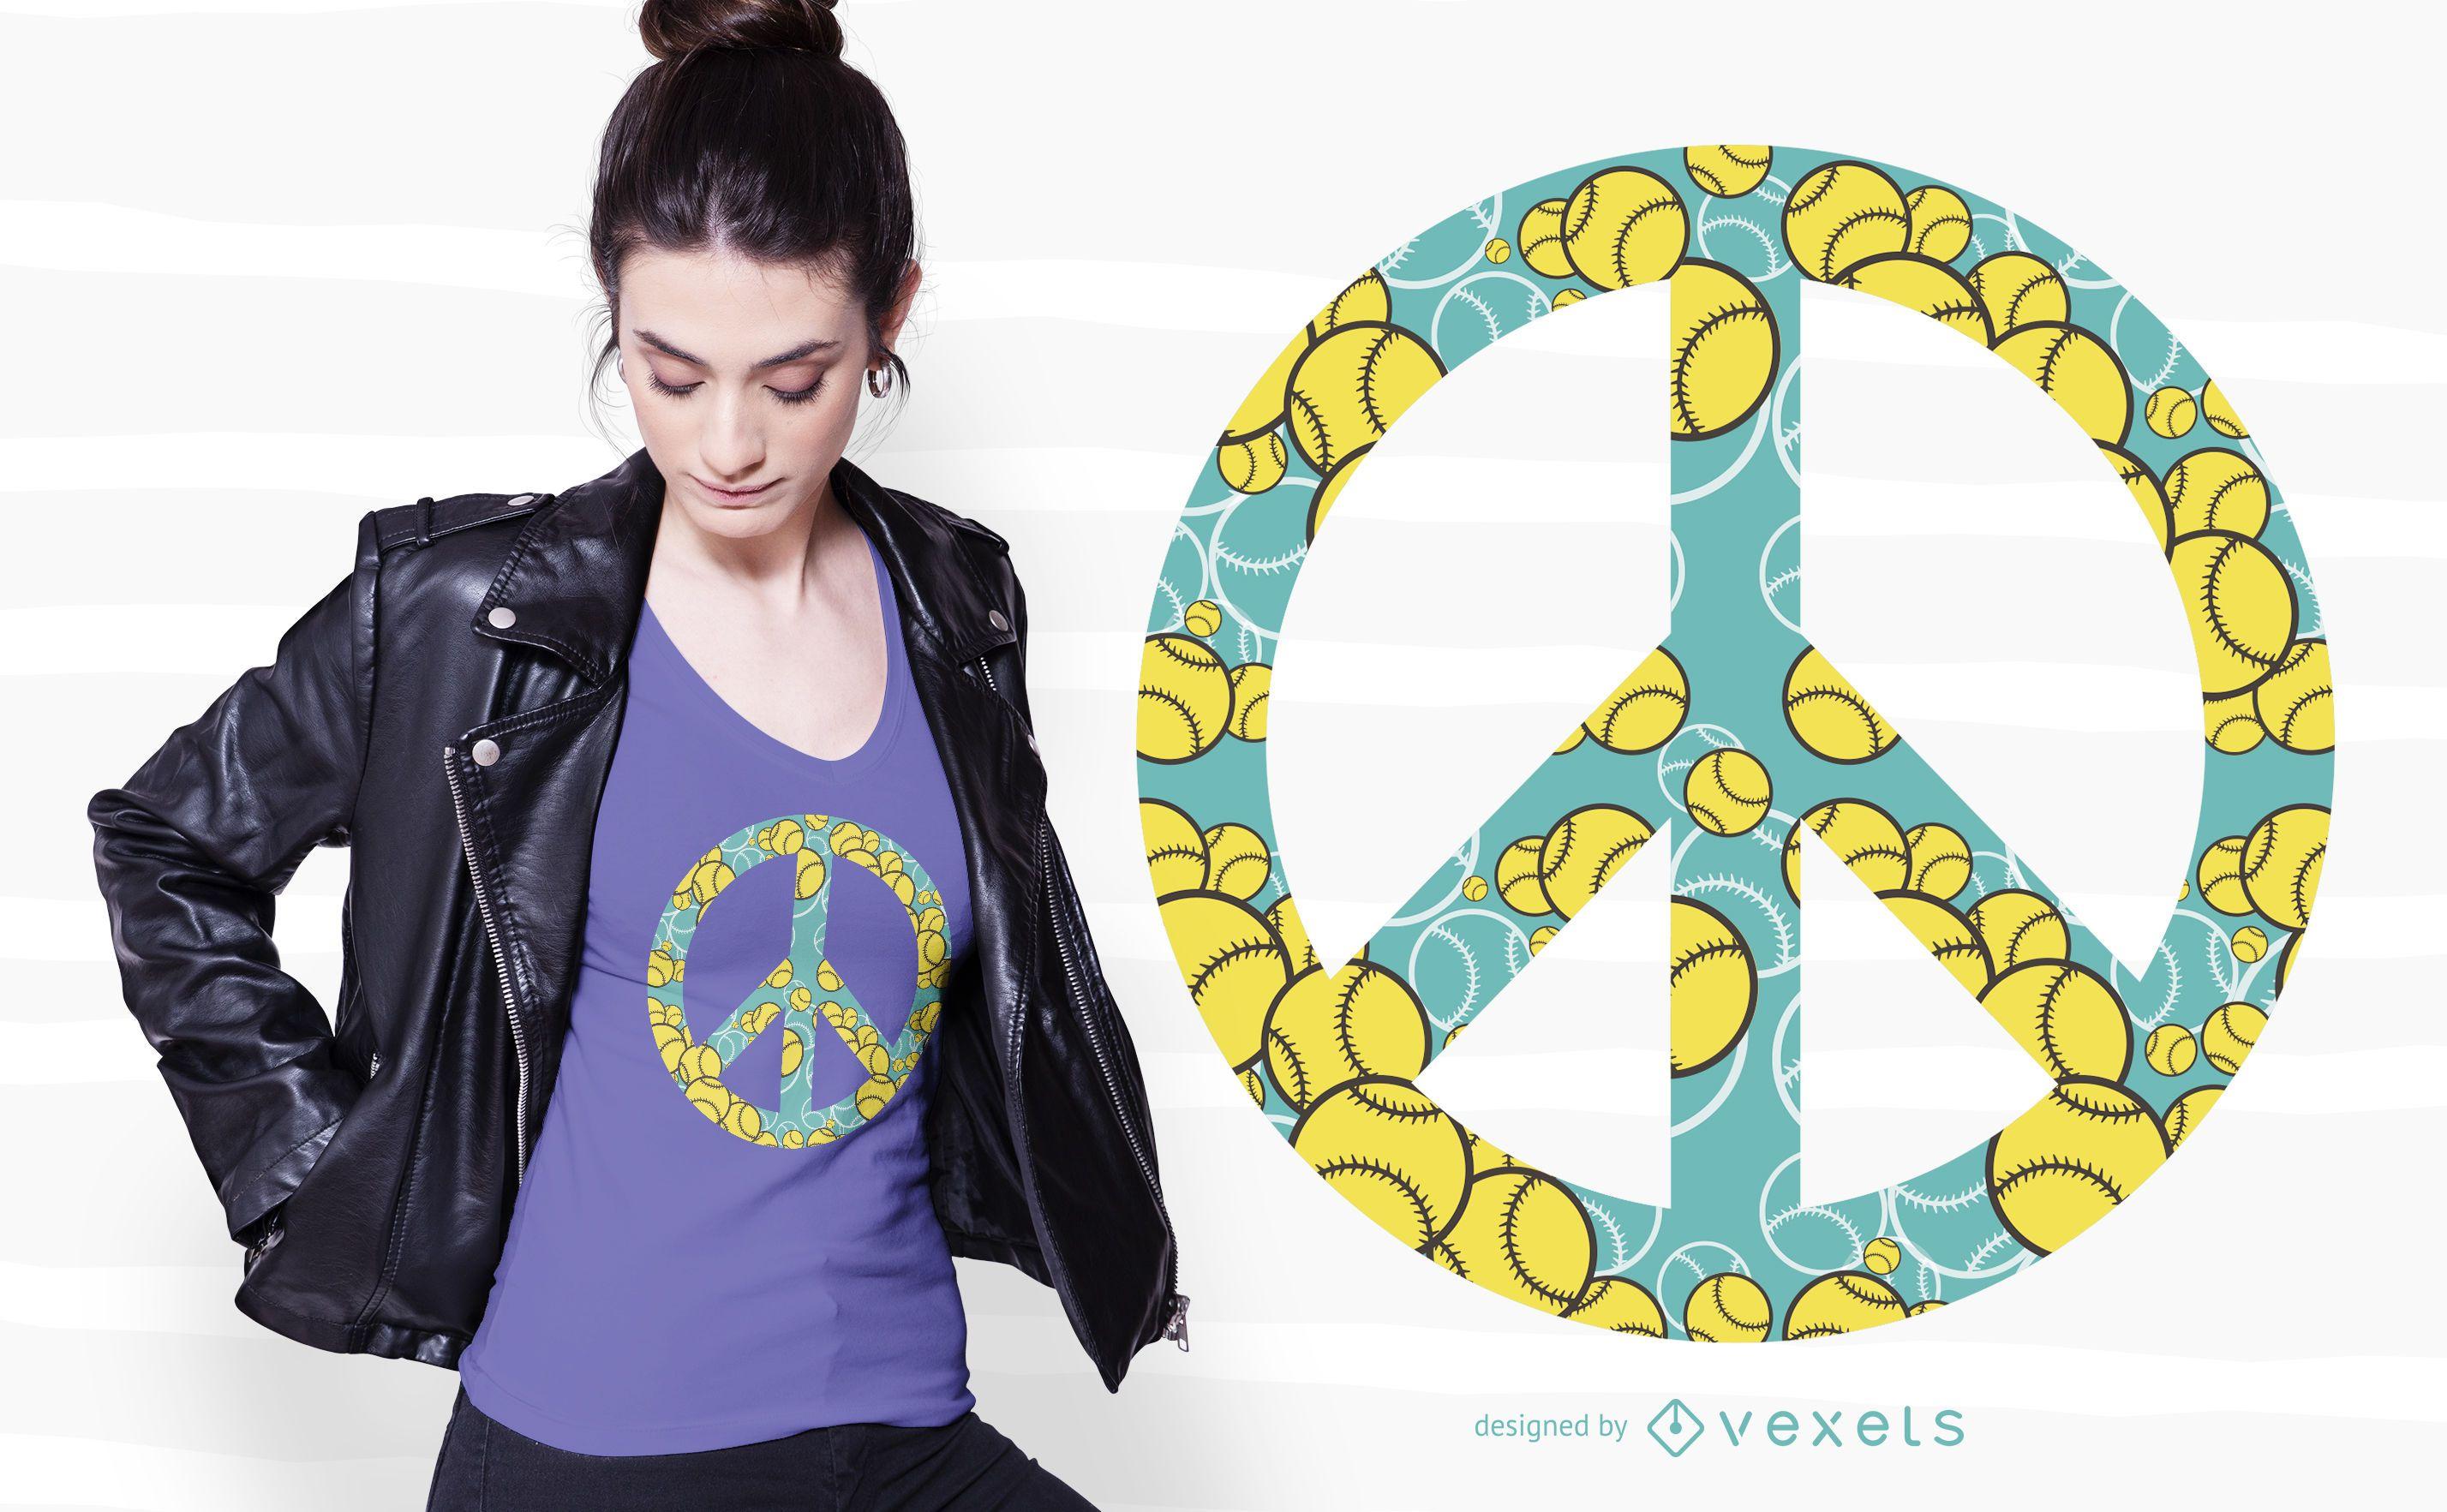 Dise?o de camiseta Tennis Peace Sign